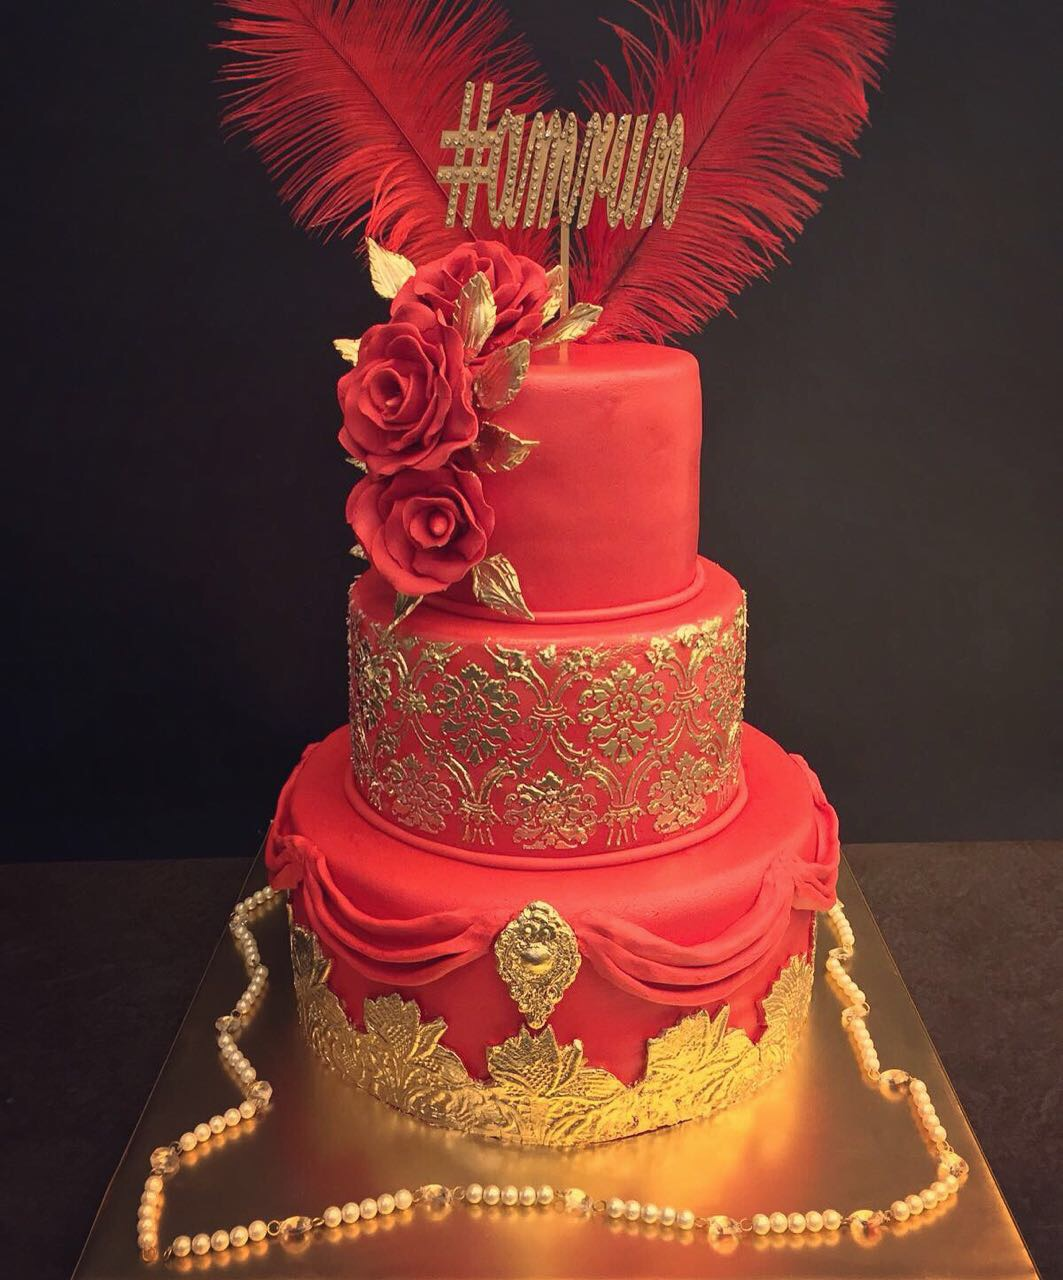 #amrun #nitinkhurana #thesweetboutique #delhi #luxurycakes #wedtease #weddingcakes #redandgold